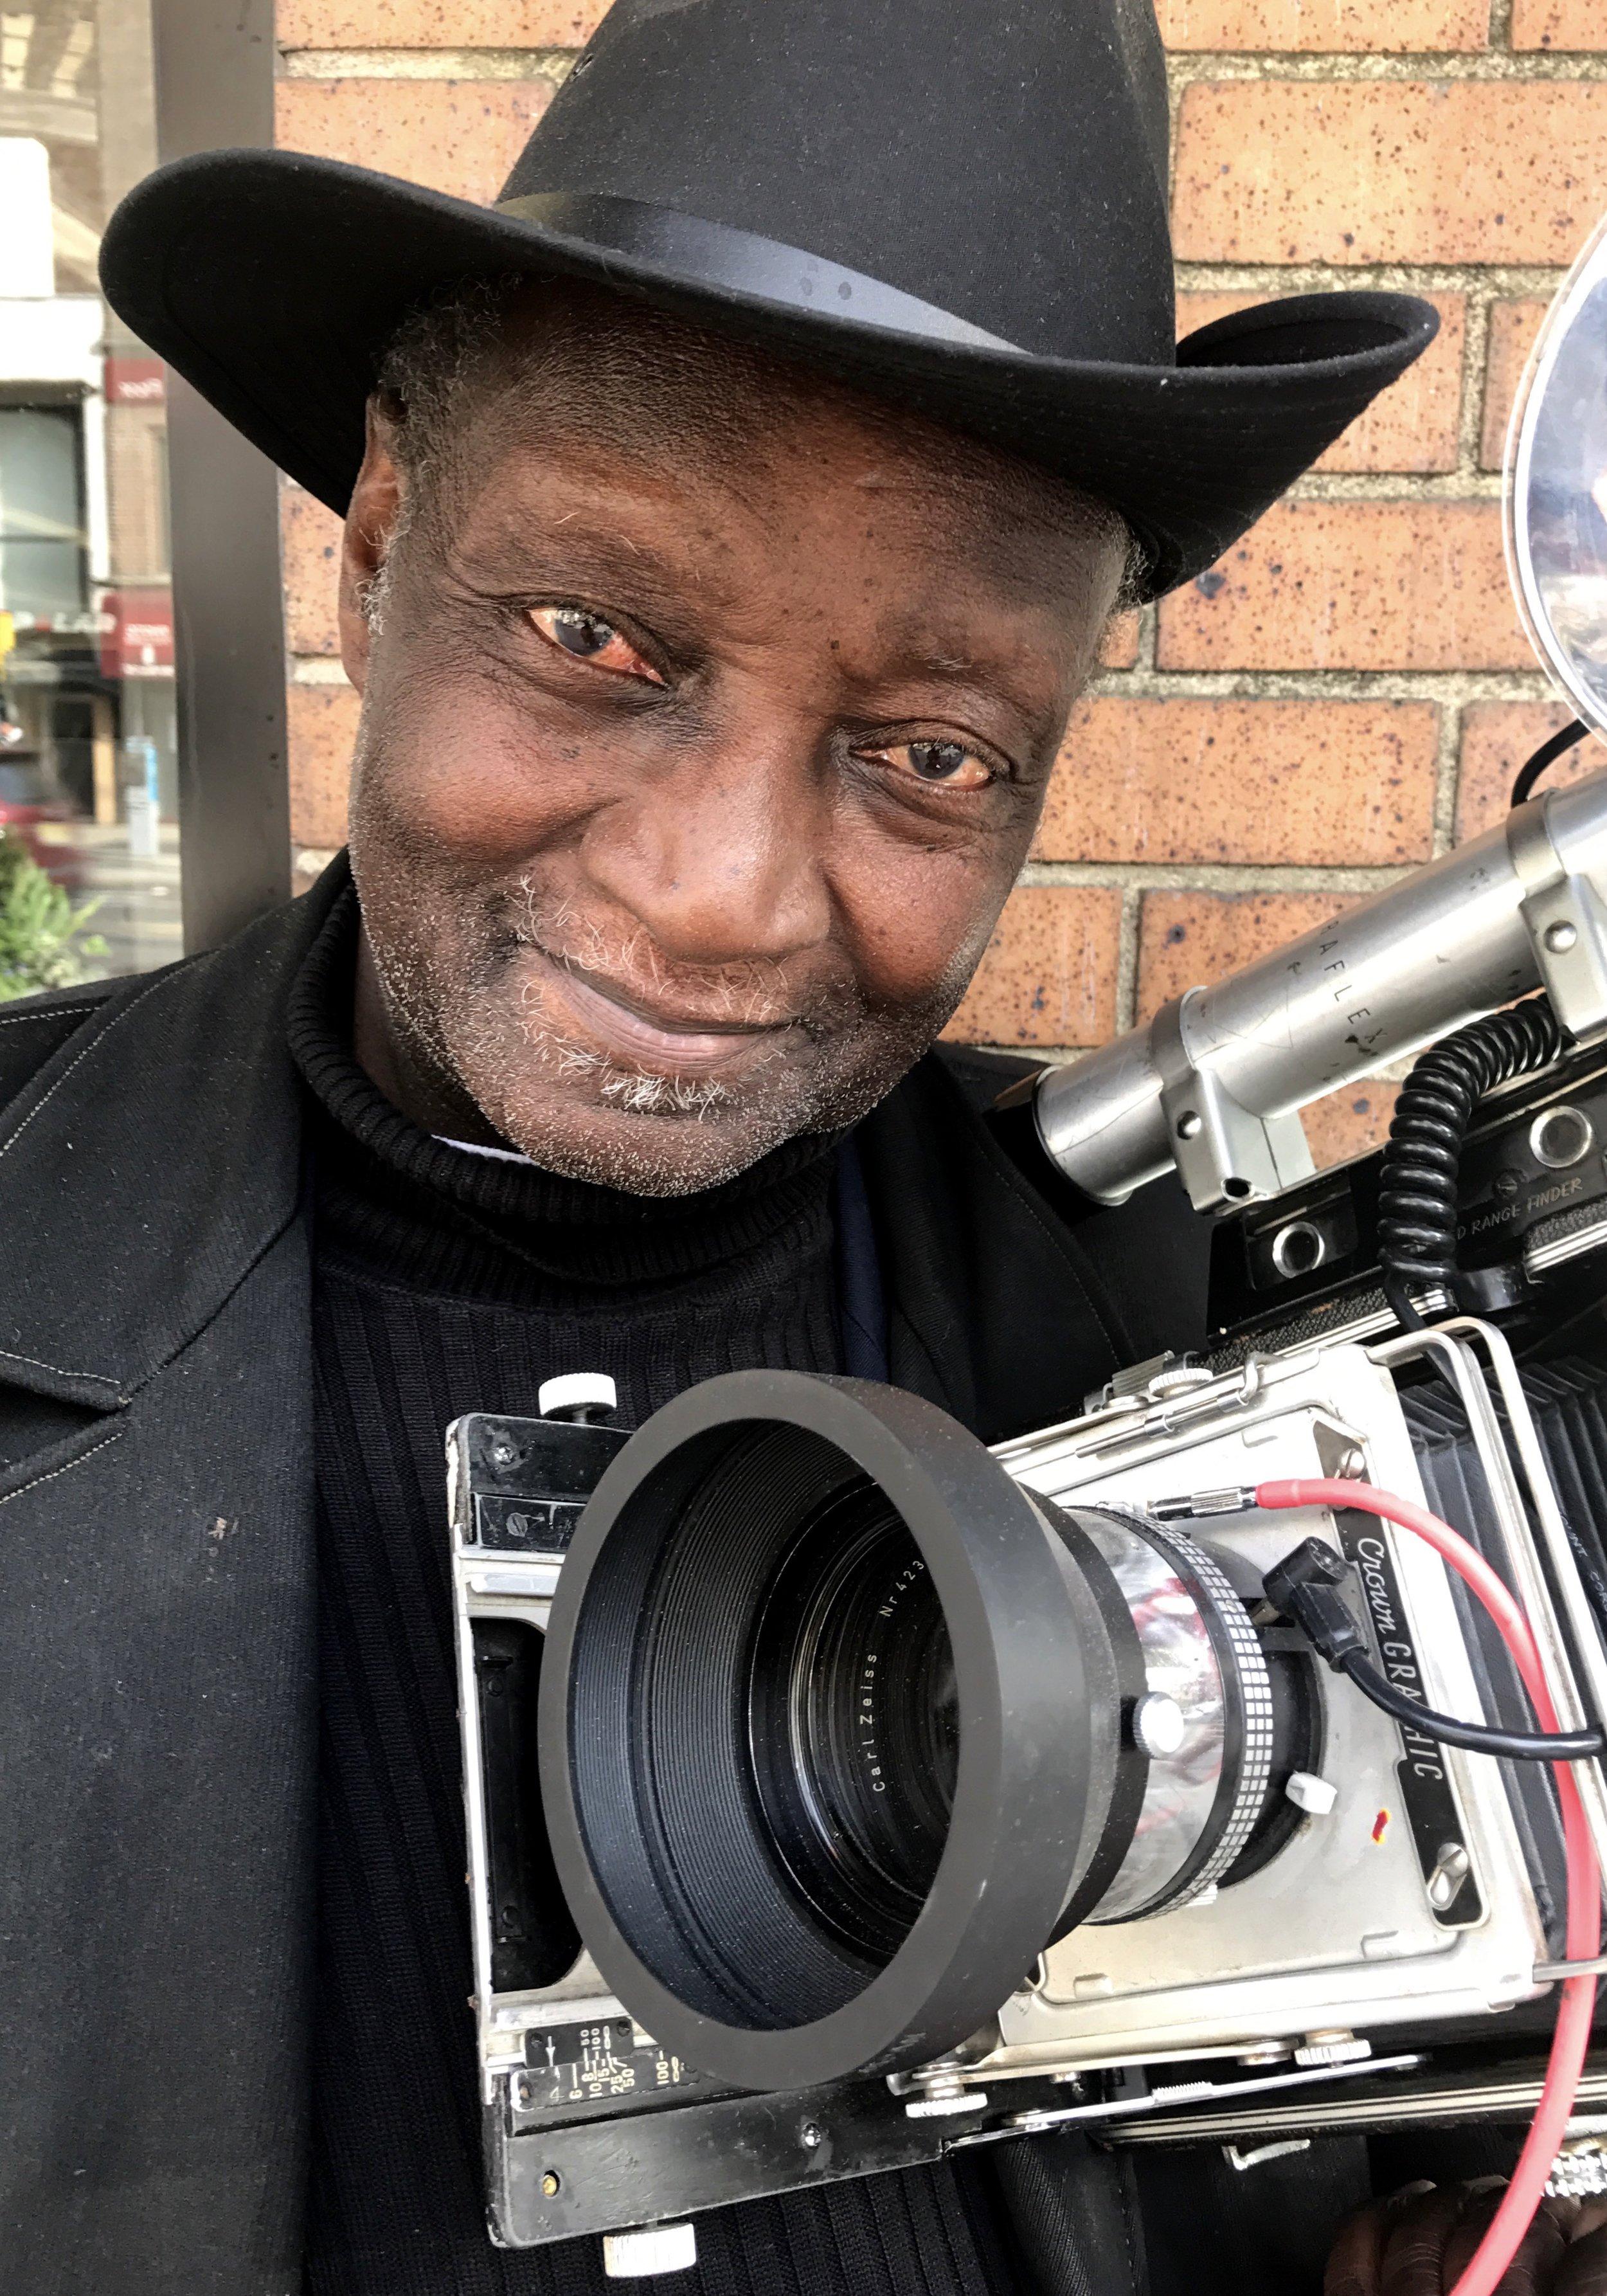 Photo Hunt | Capturing People (Louis Mendes)